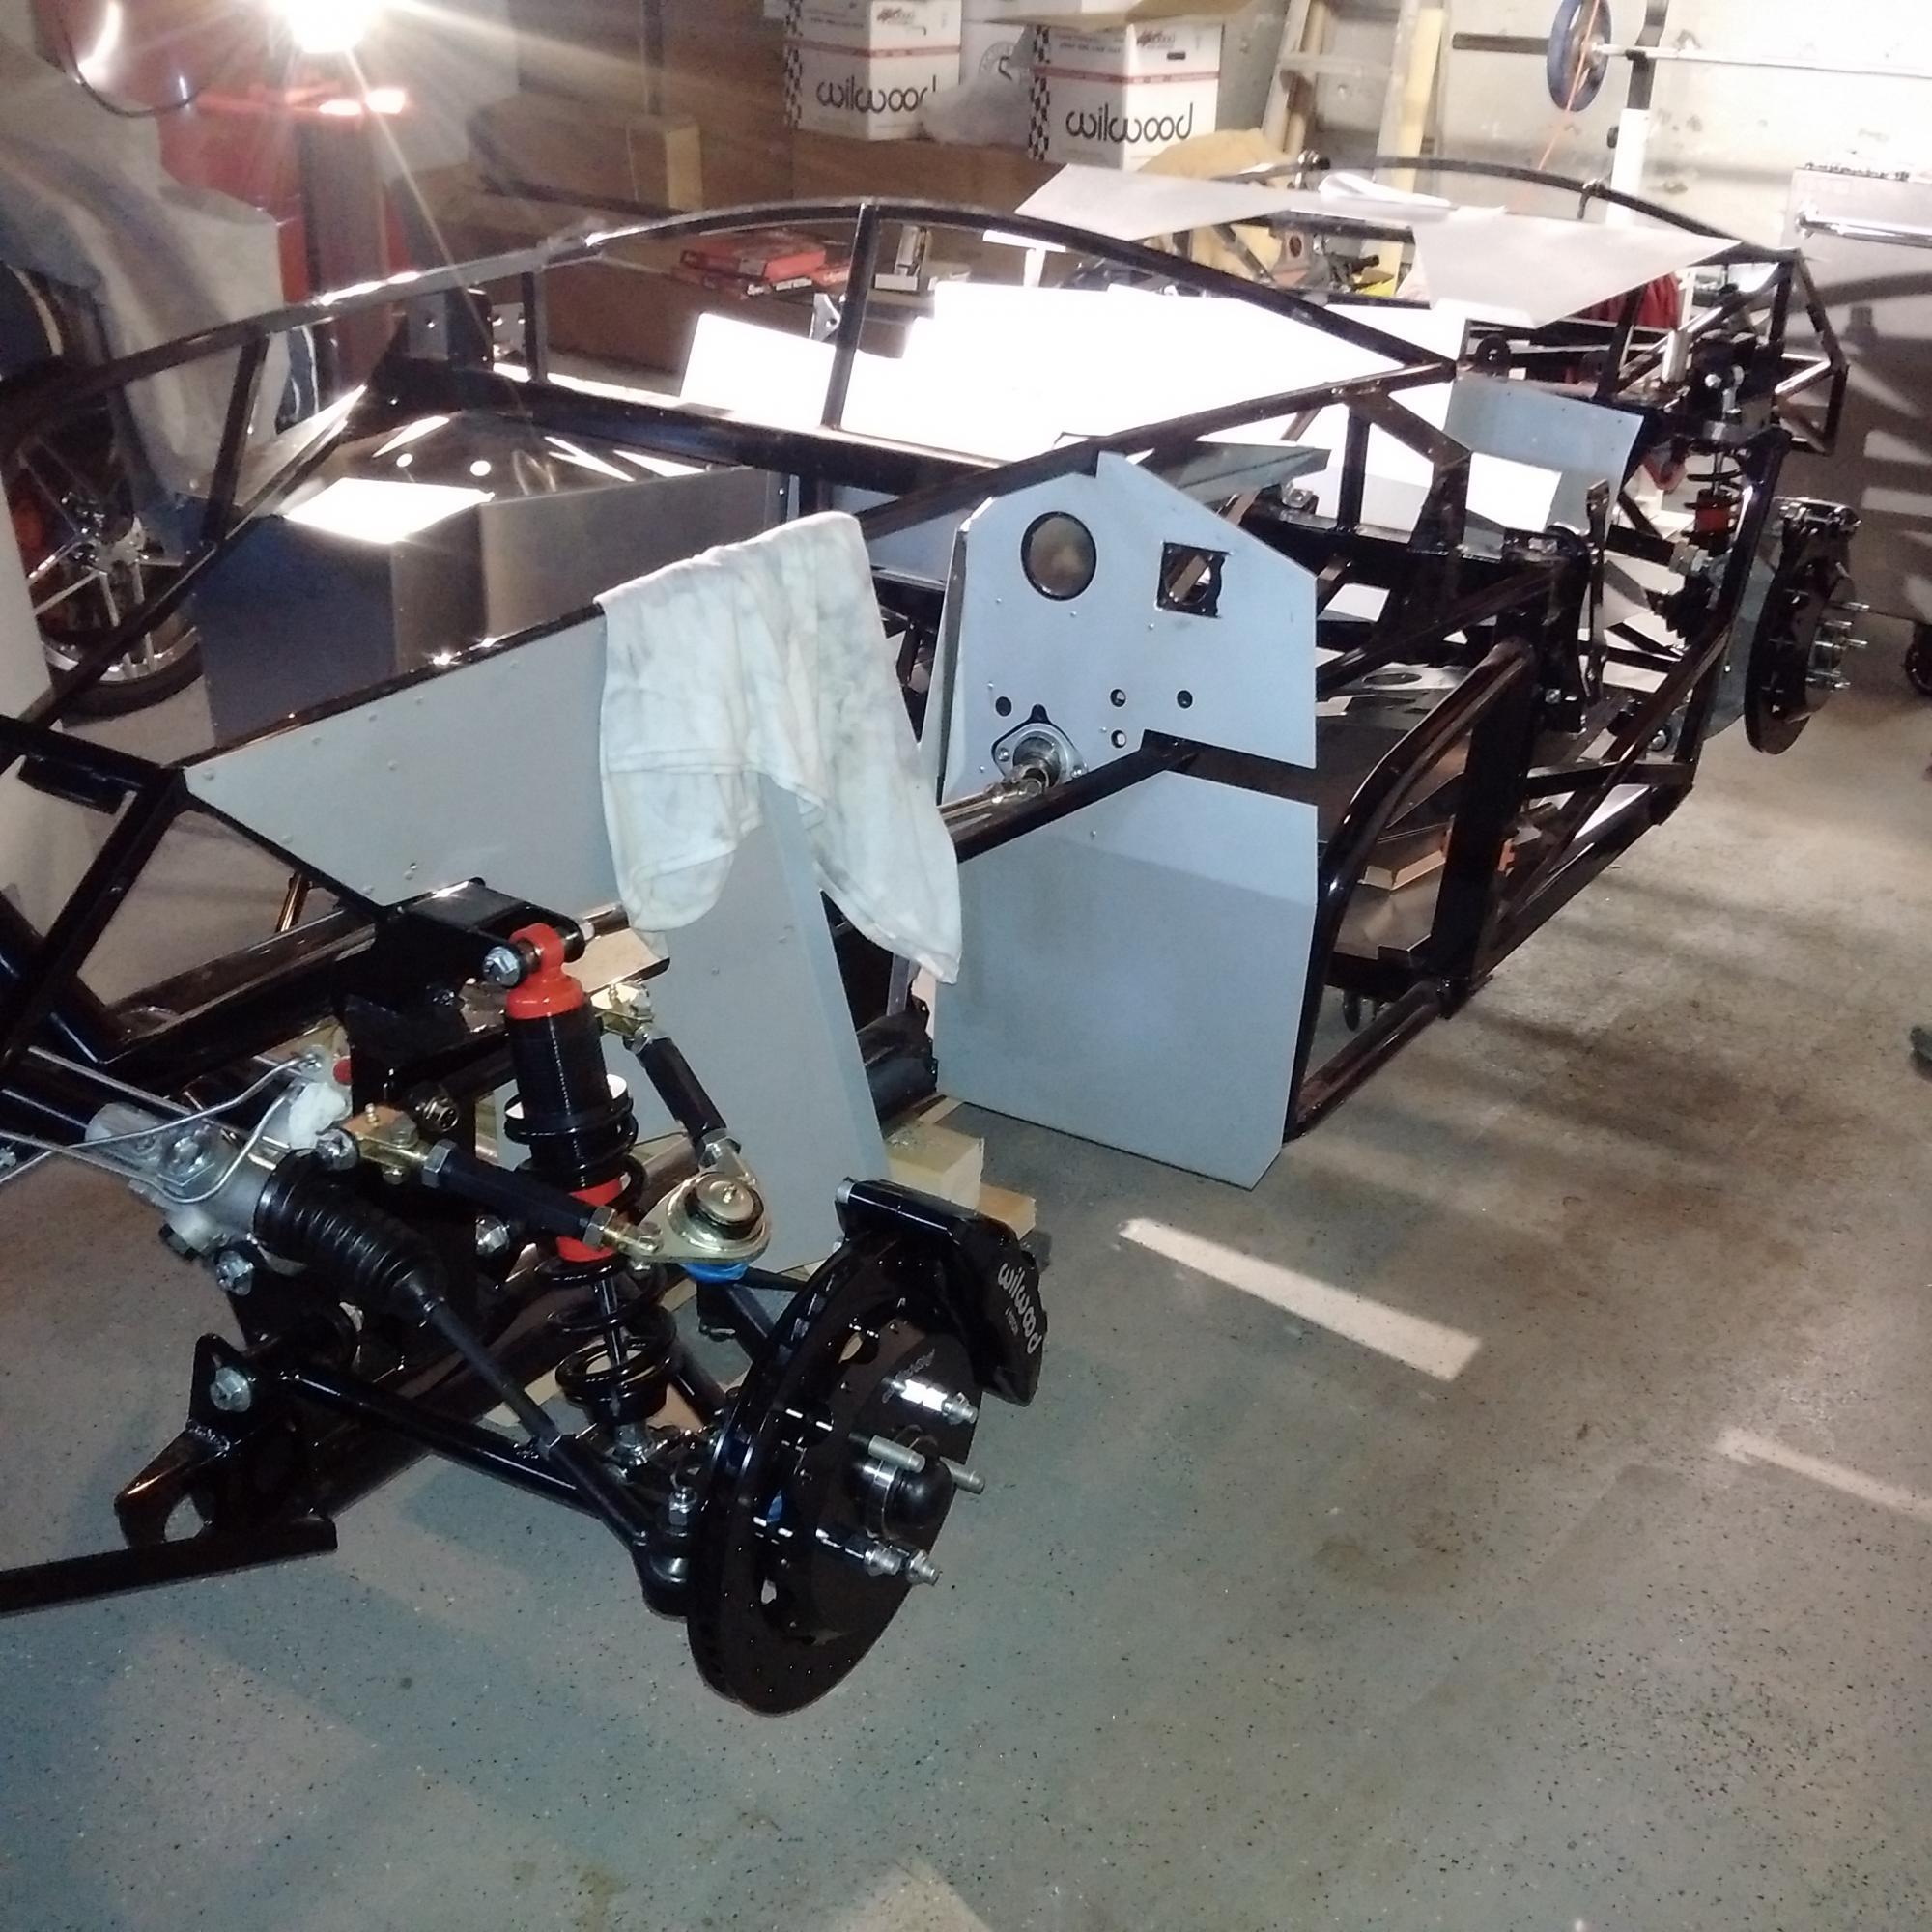 My Cousin Vinny's Factory Five Cobra build-img_20161211_133414.jpg